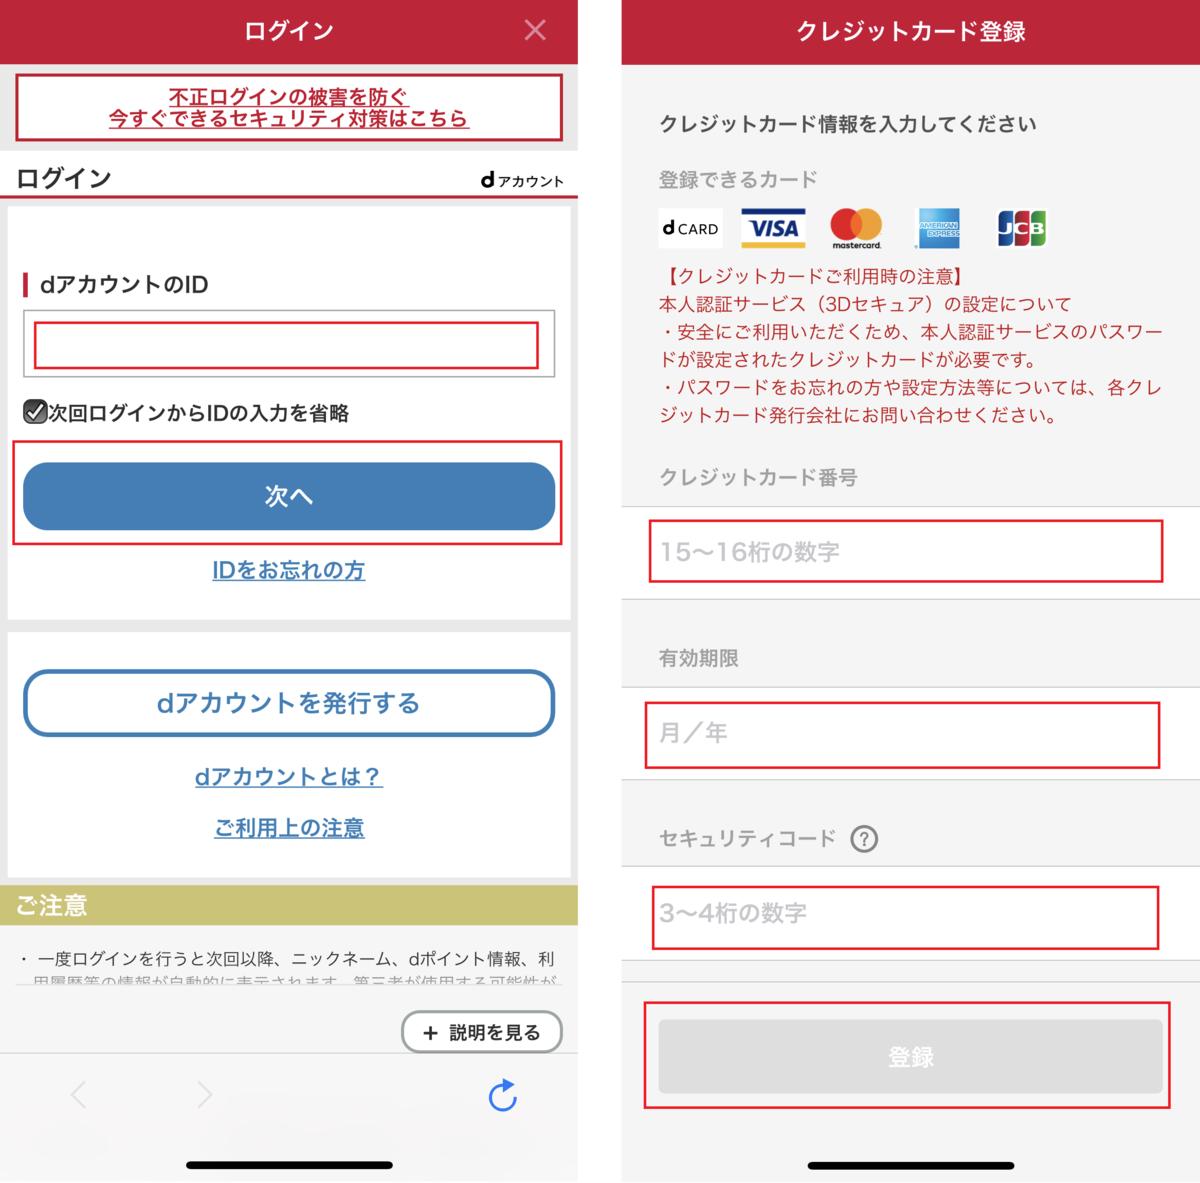 f:id:Sabuaka:20190717020748p:plain